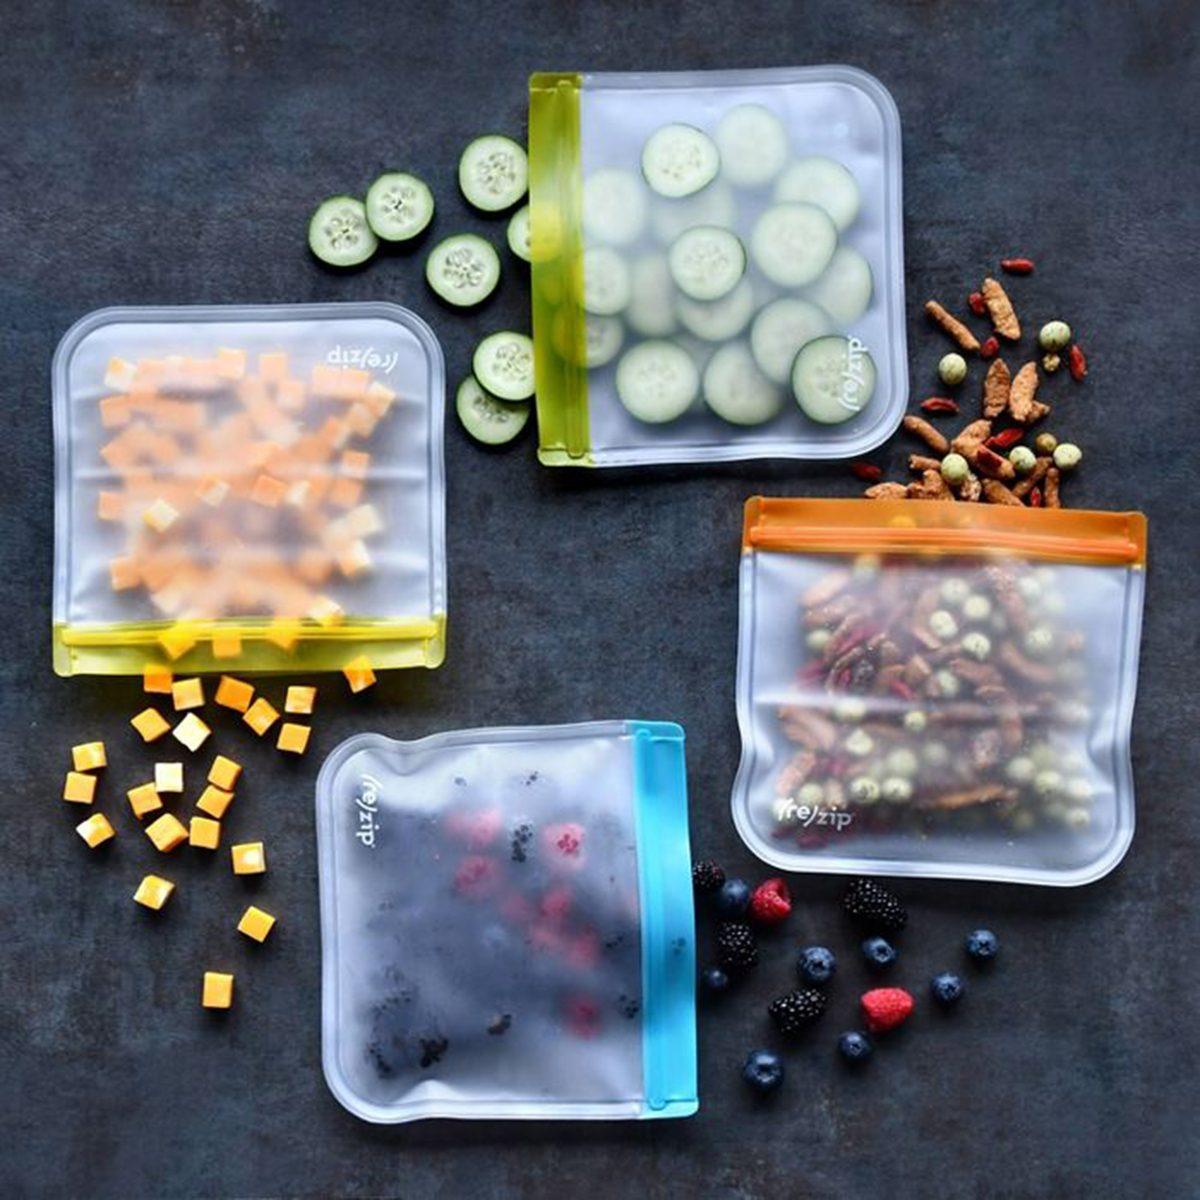 (re)zip Lay Flat Leak Proof Reusable Lunch Bag - 5ct